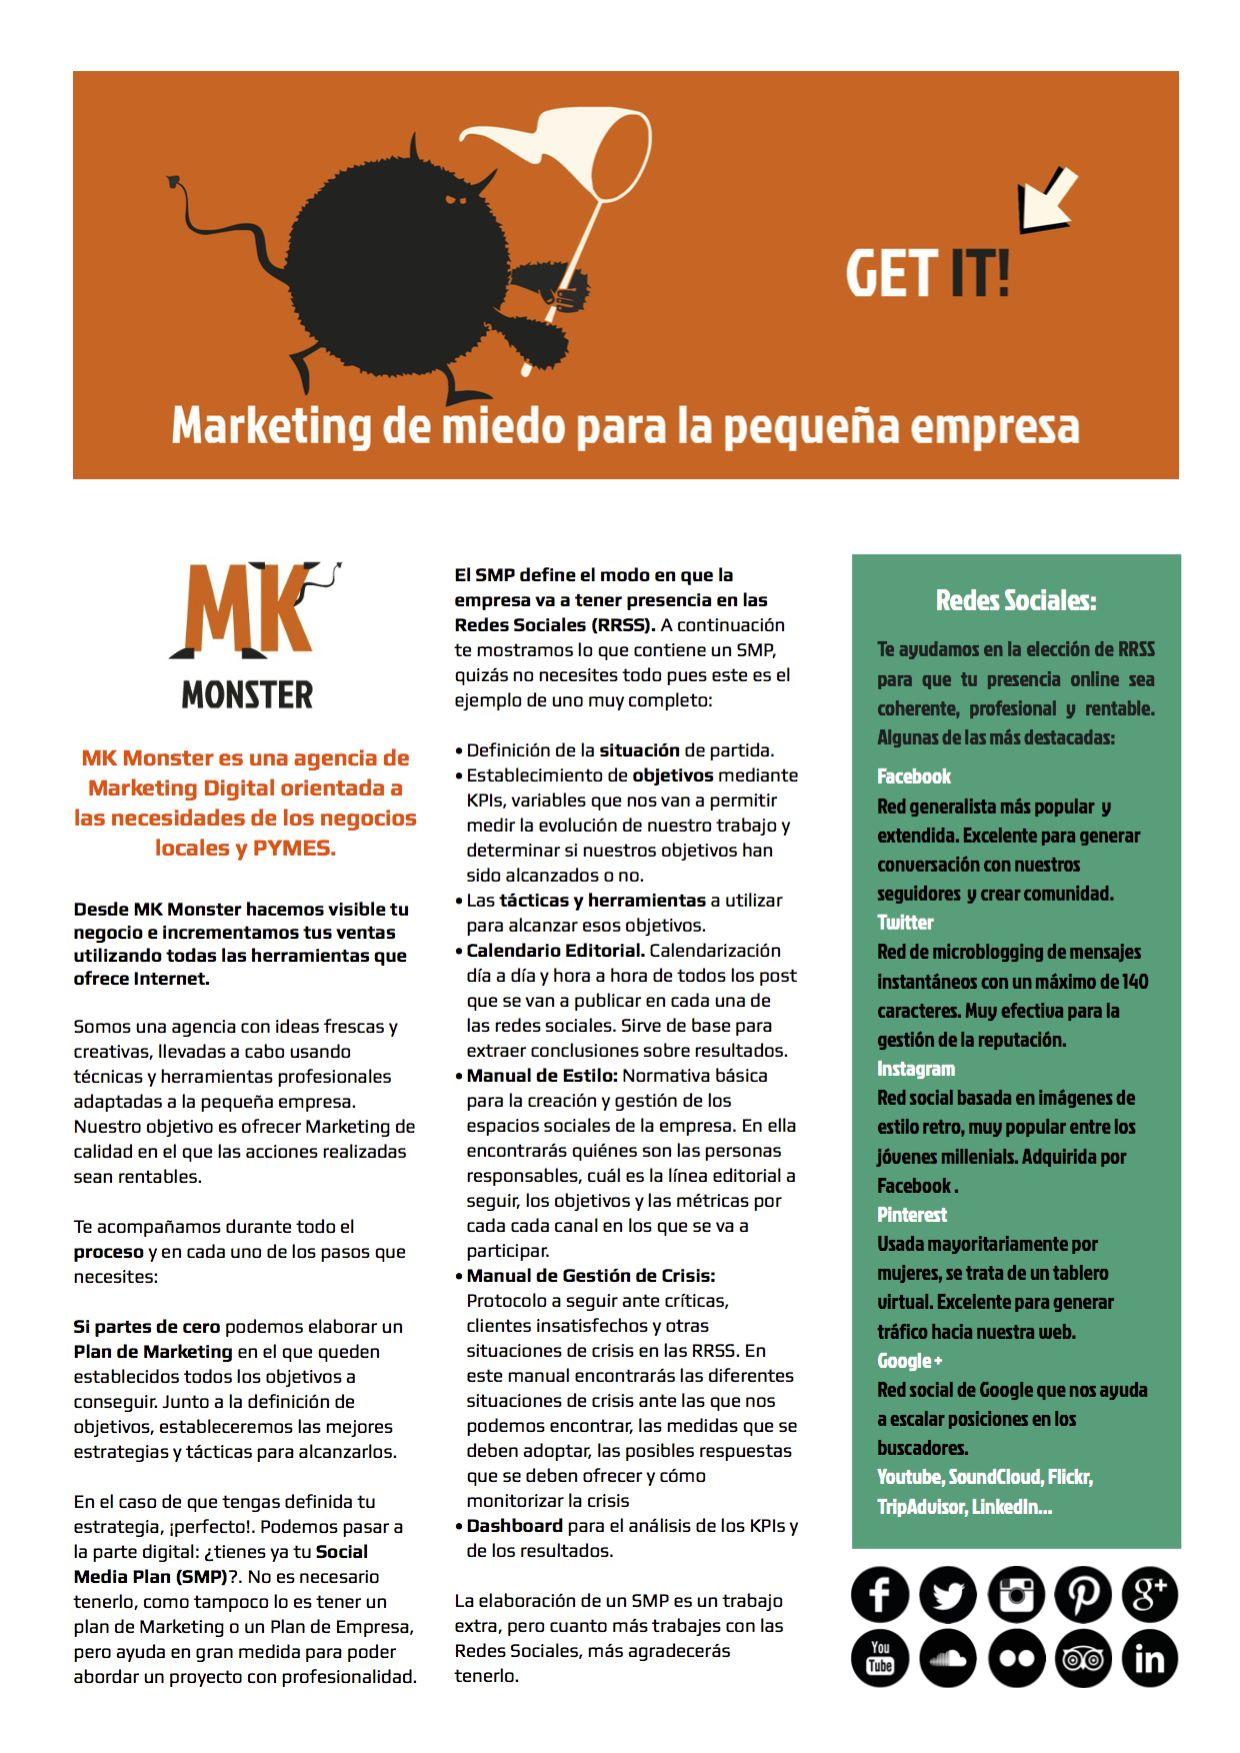 MK Monster | Marketing de miedo | Catálogo de servicios p1